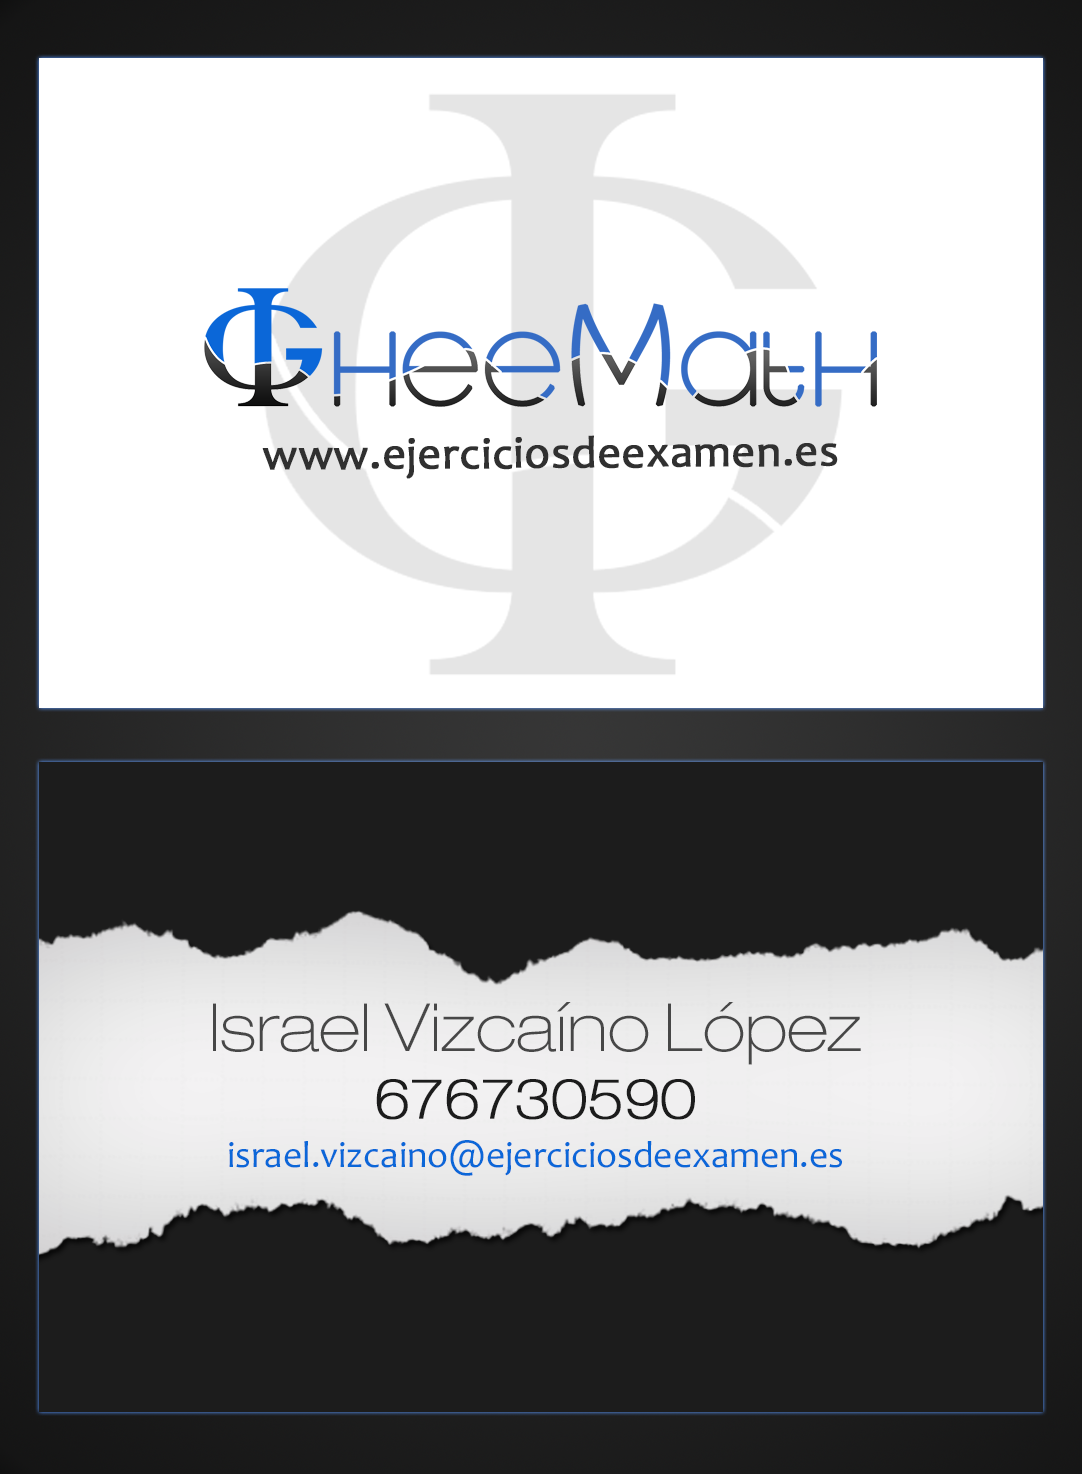 Diseño tarjeta GheeMarth